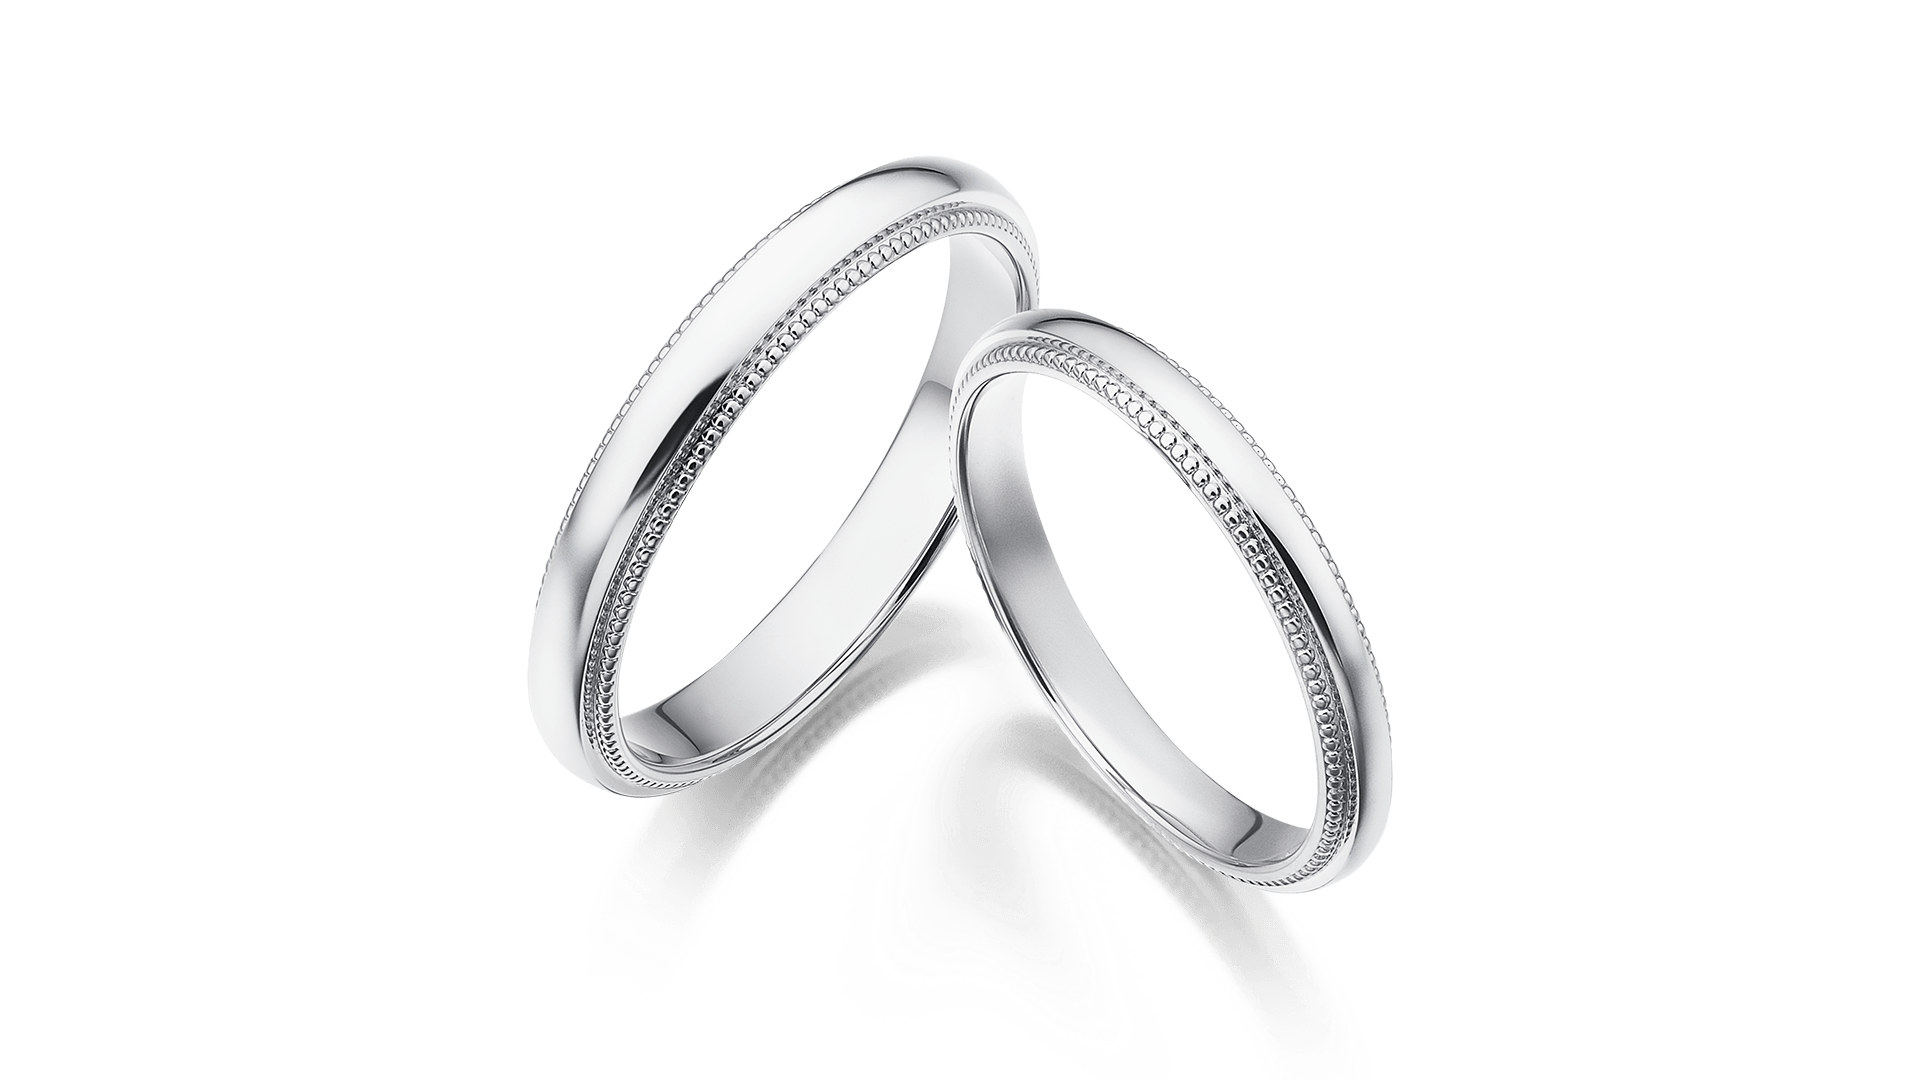 helios ヘリオス | 結婚指輪サムネイル 2